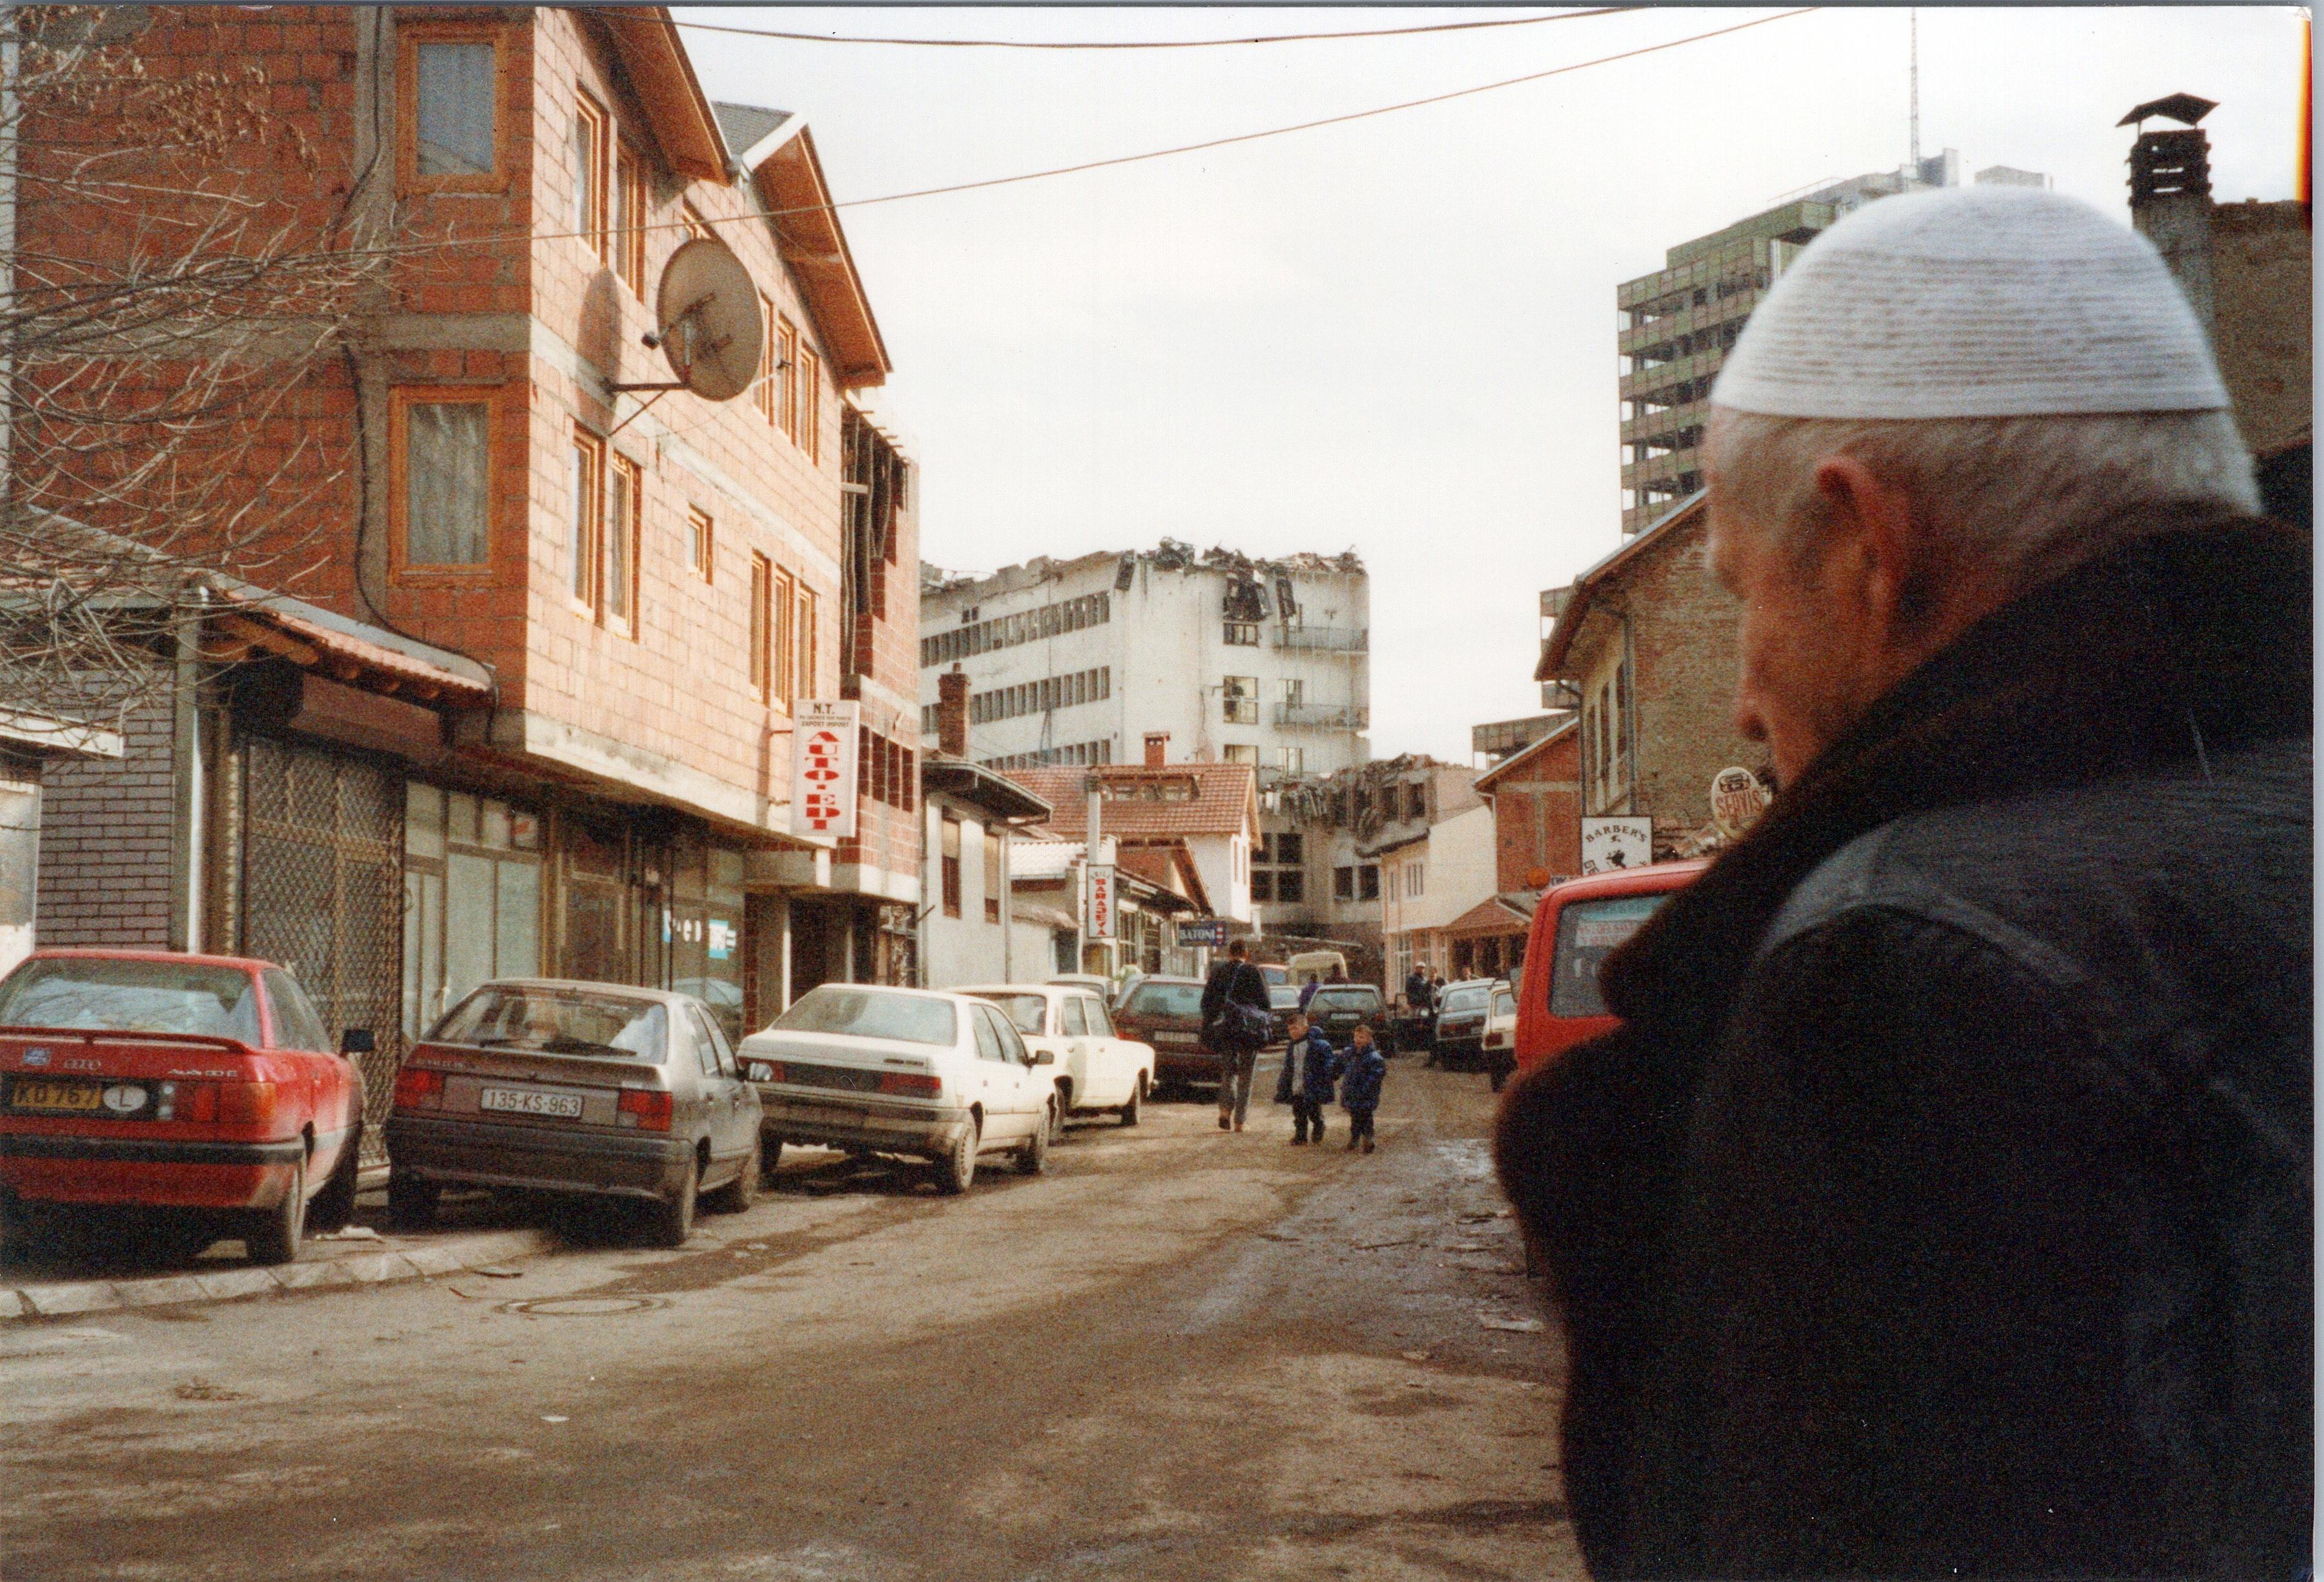 Kosovo Street Scene, March 2020